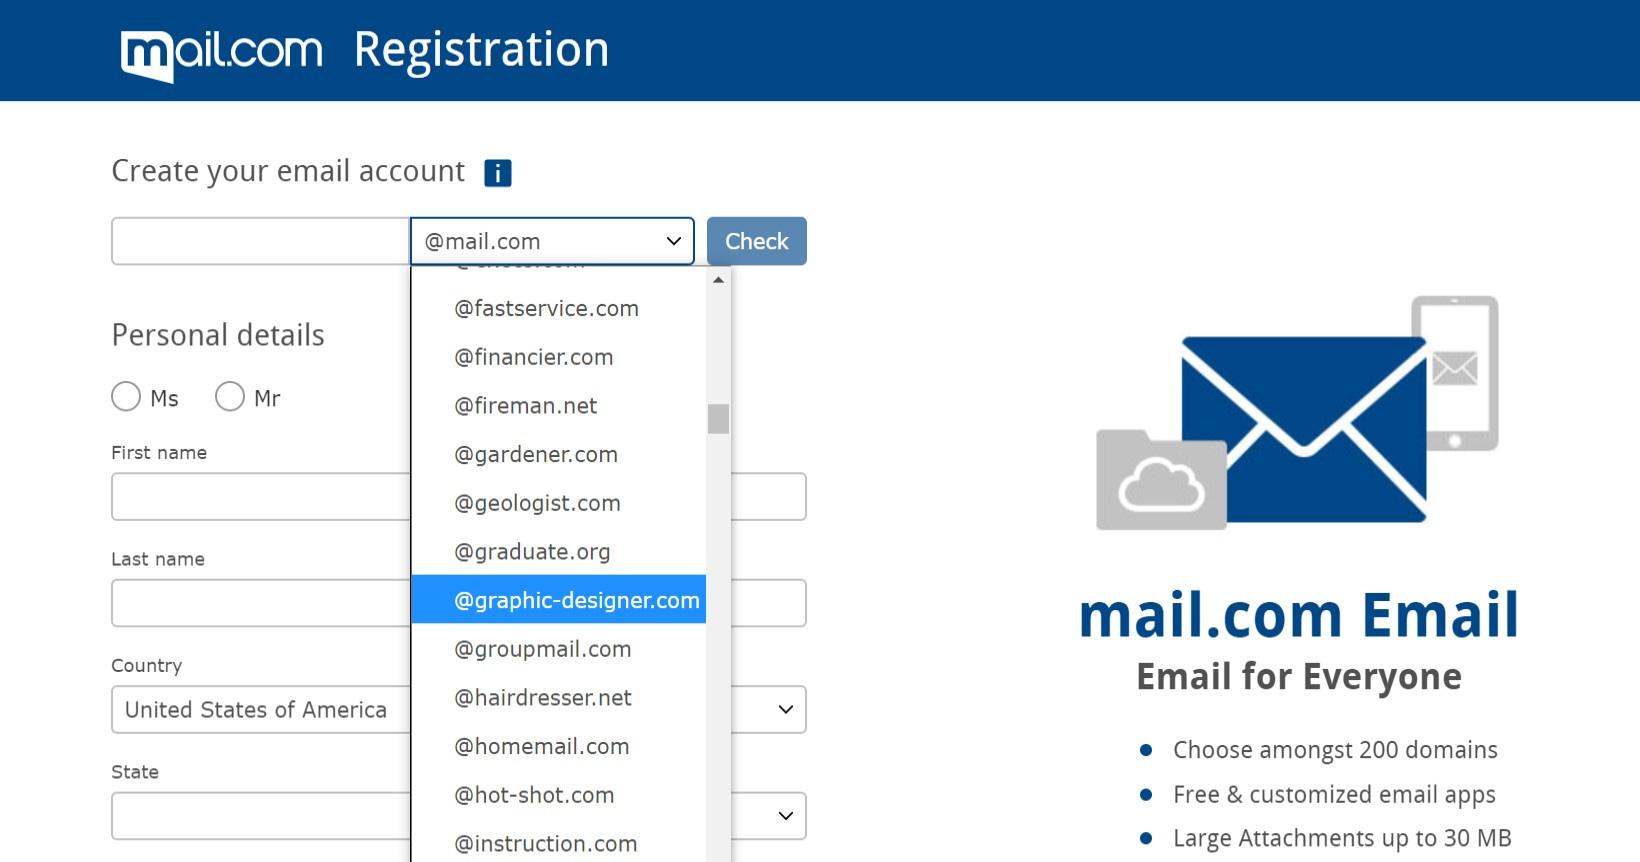 La página de registro de Mail.com.